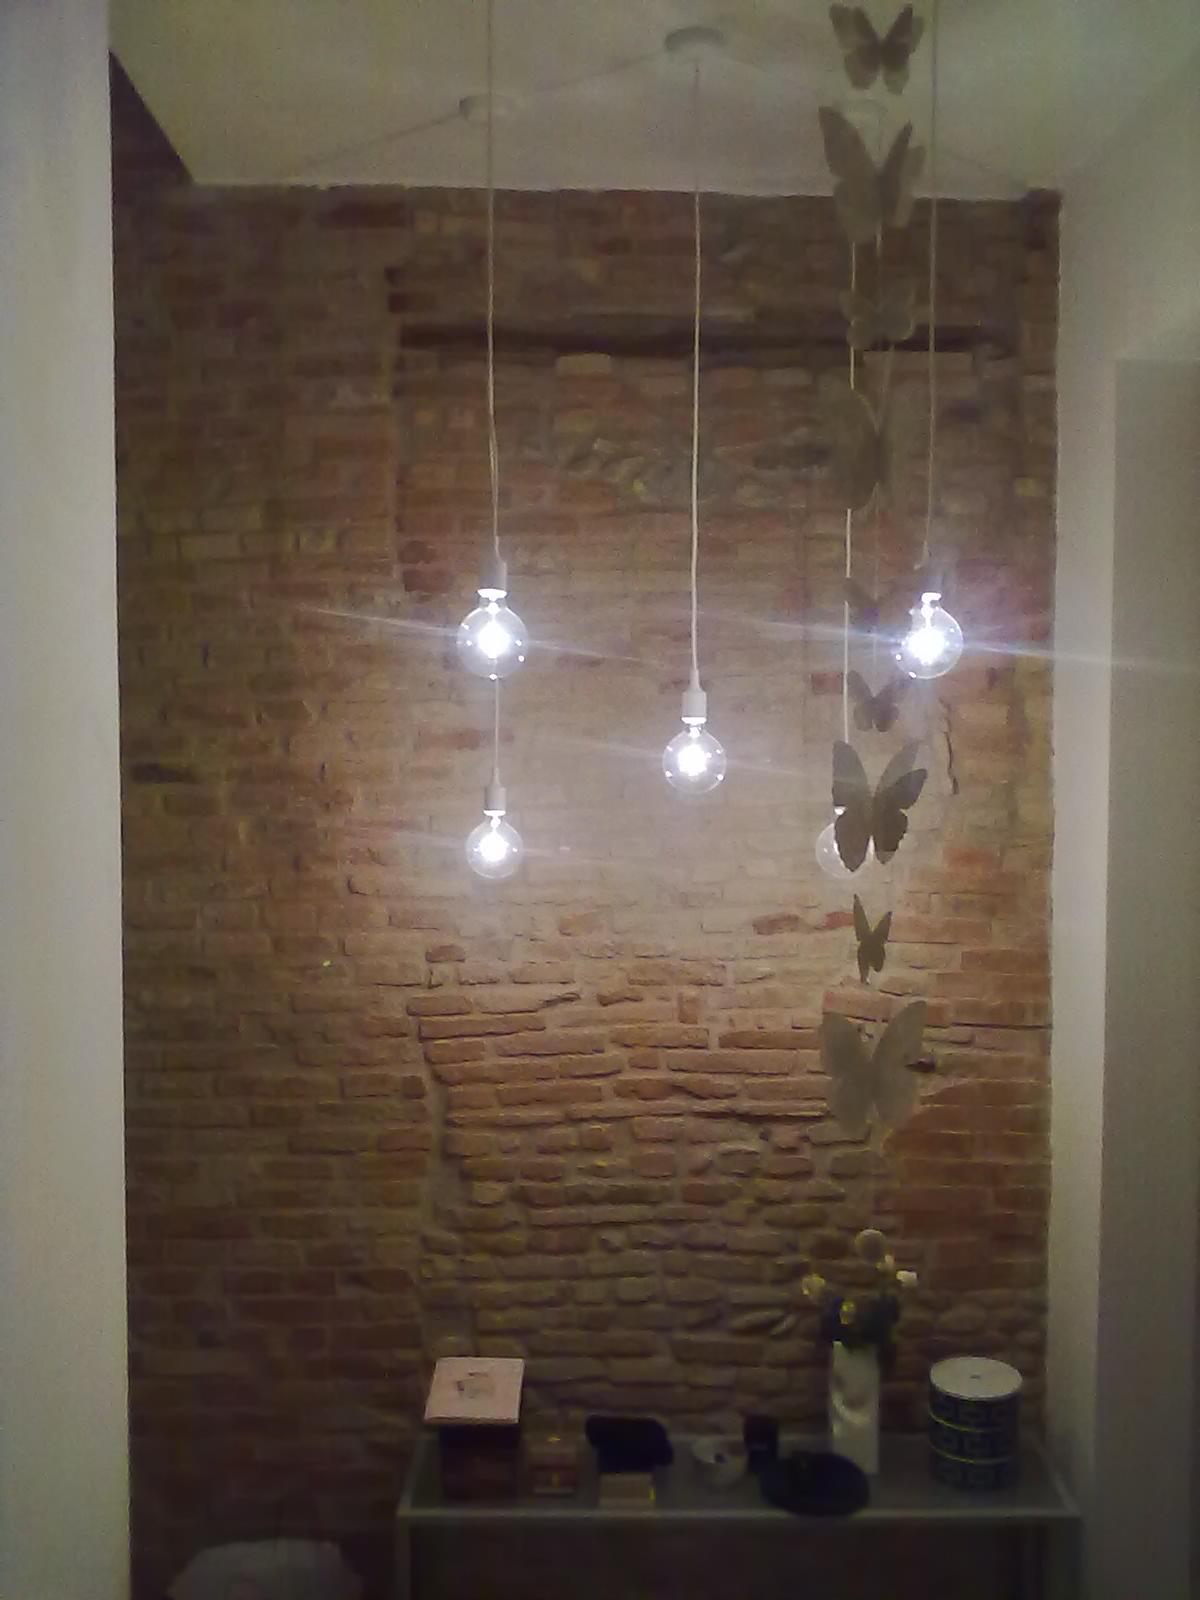 lampadari vesoi : Forum Arredamento.it ?Lampadari a sospensione per cucina